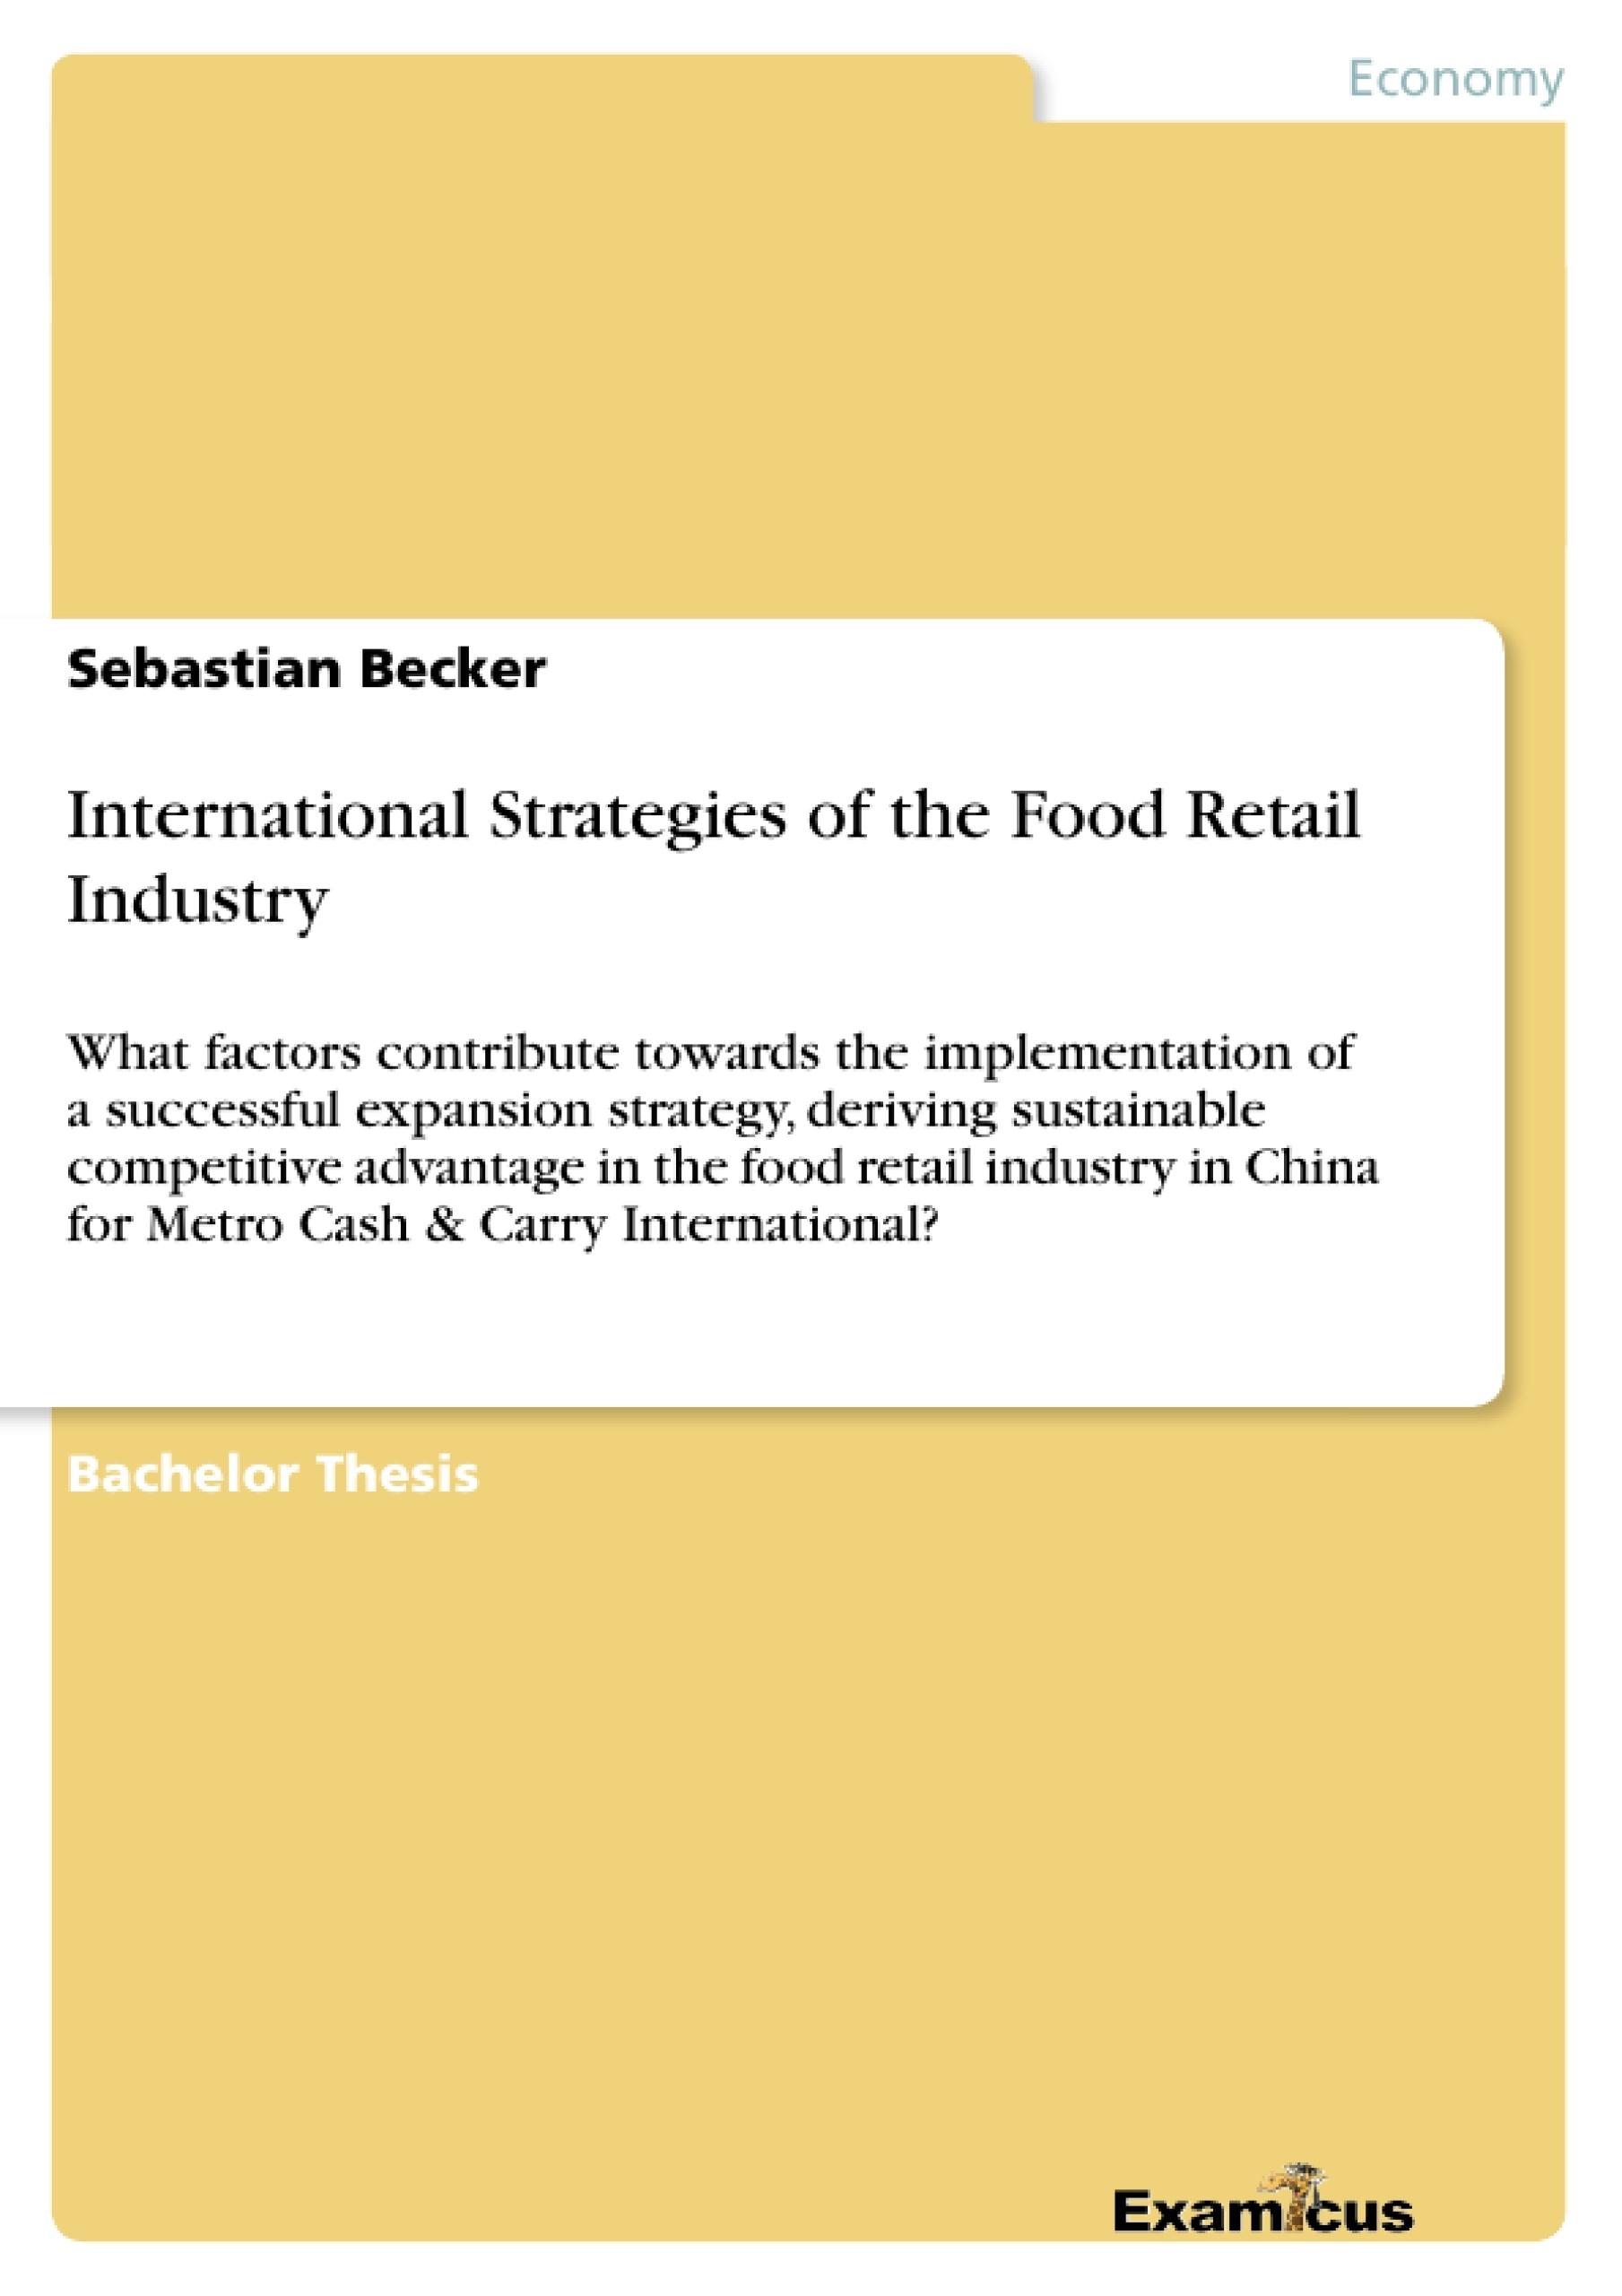 Title: International Strategies of the Food Retail Industry